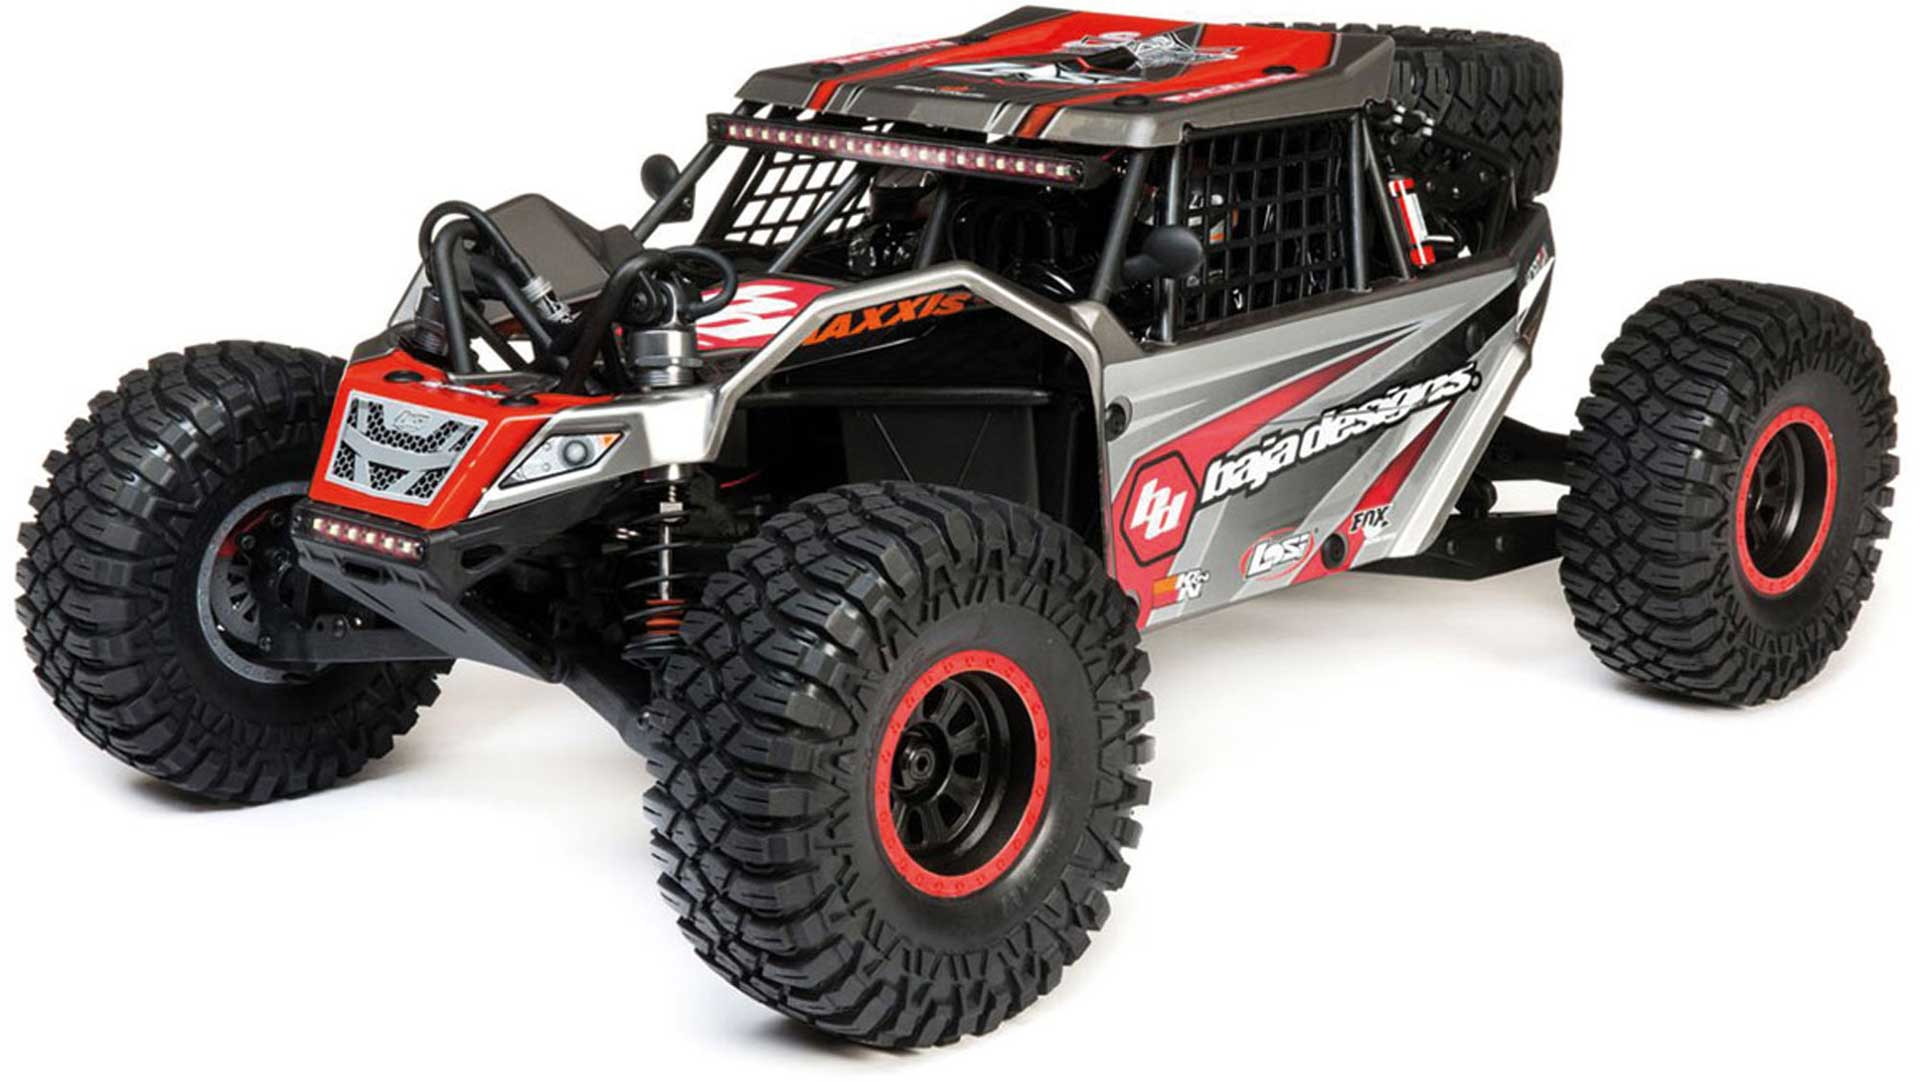 LOSI SUPER ROCK REY® AVC® 1/6 4WD RTR AVC R/G ROCKRACER-BAJADESIGNS